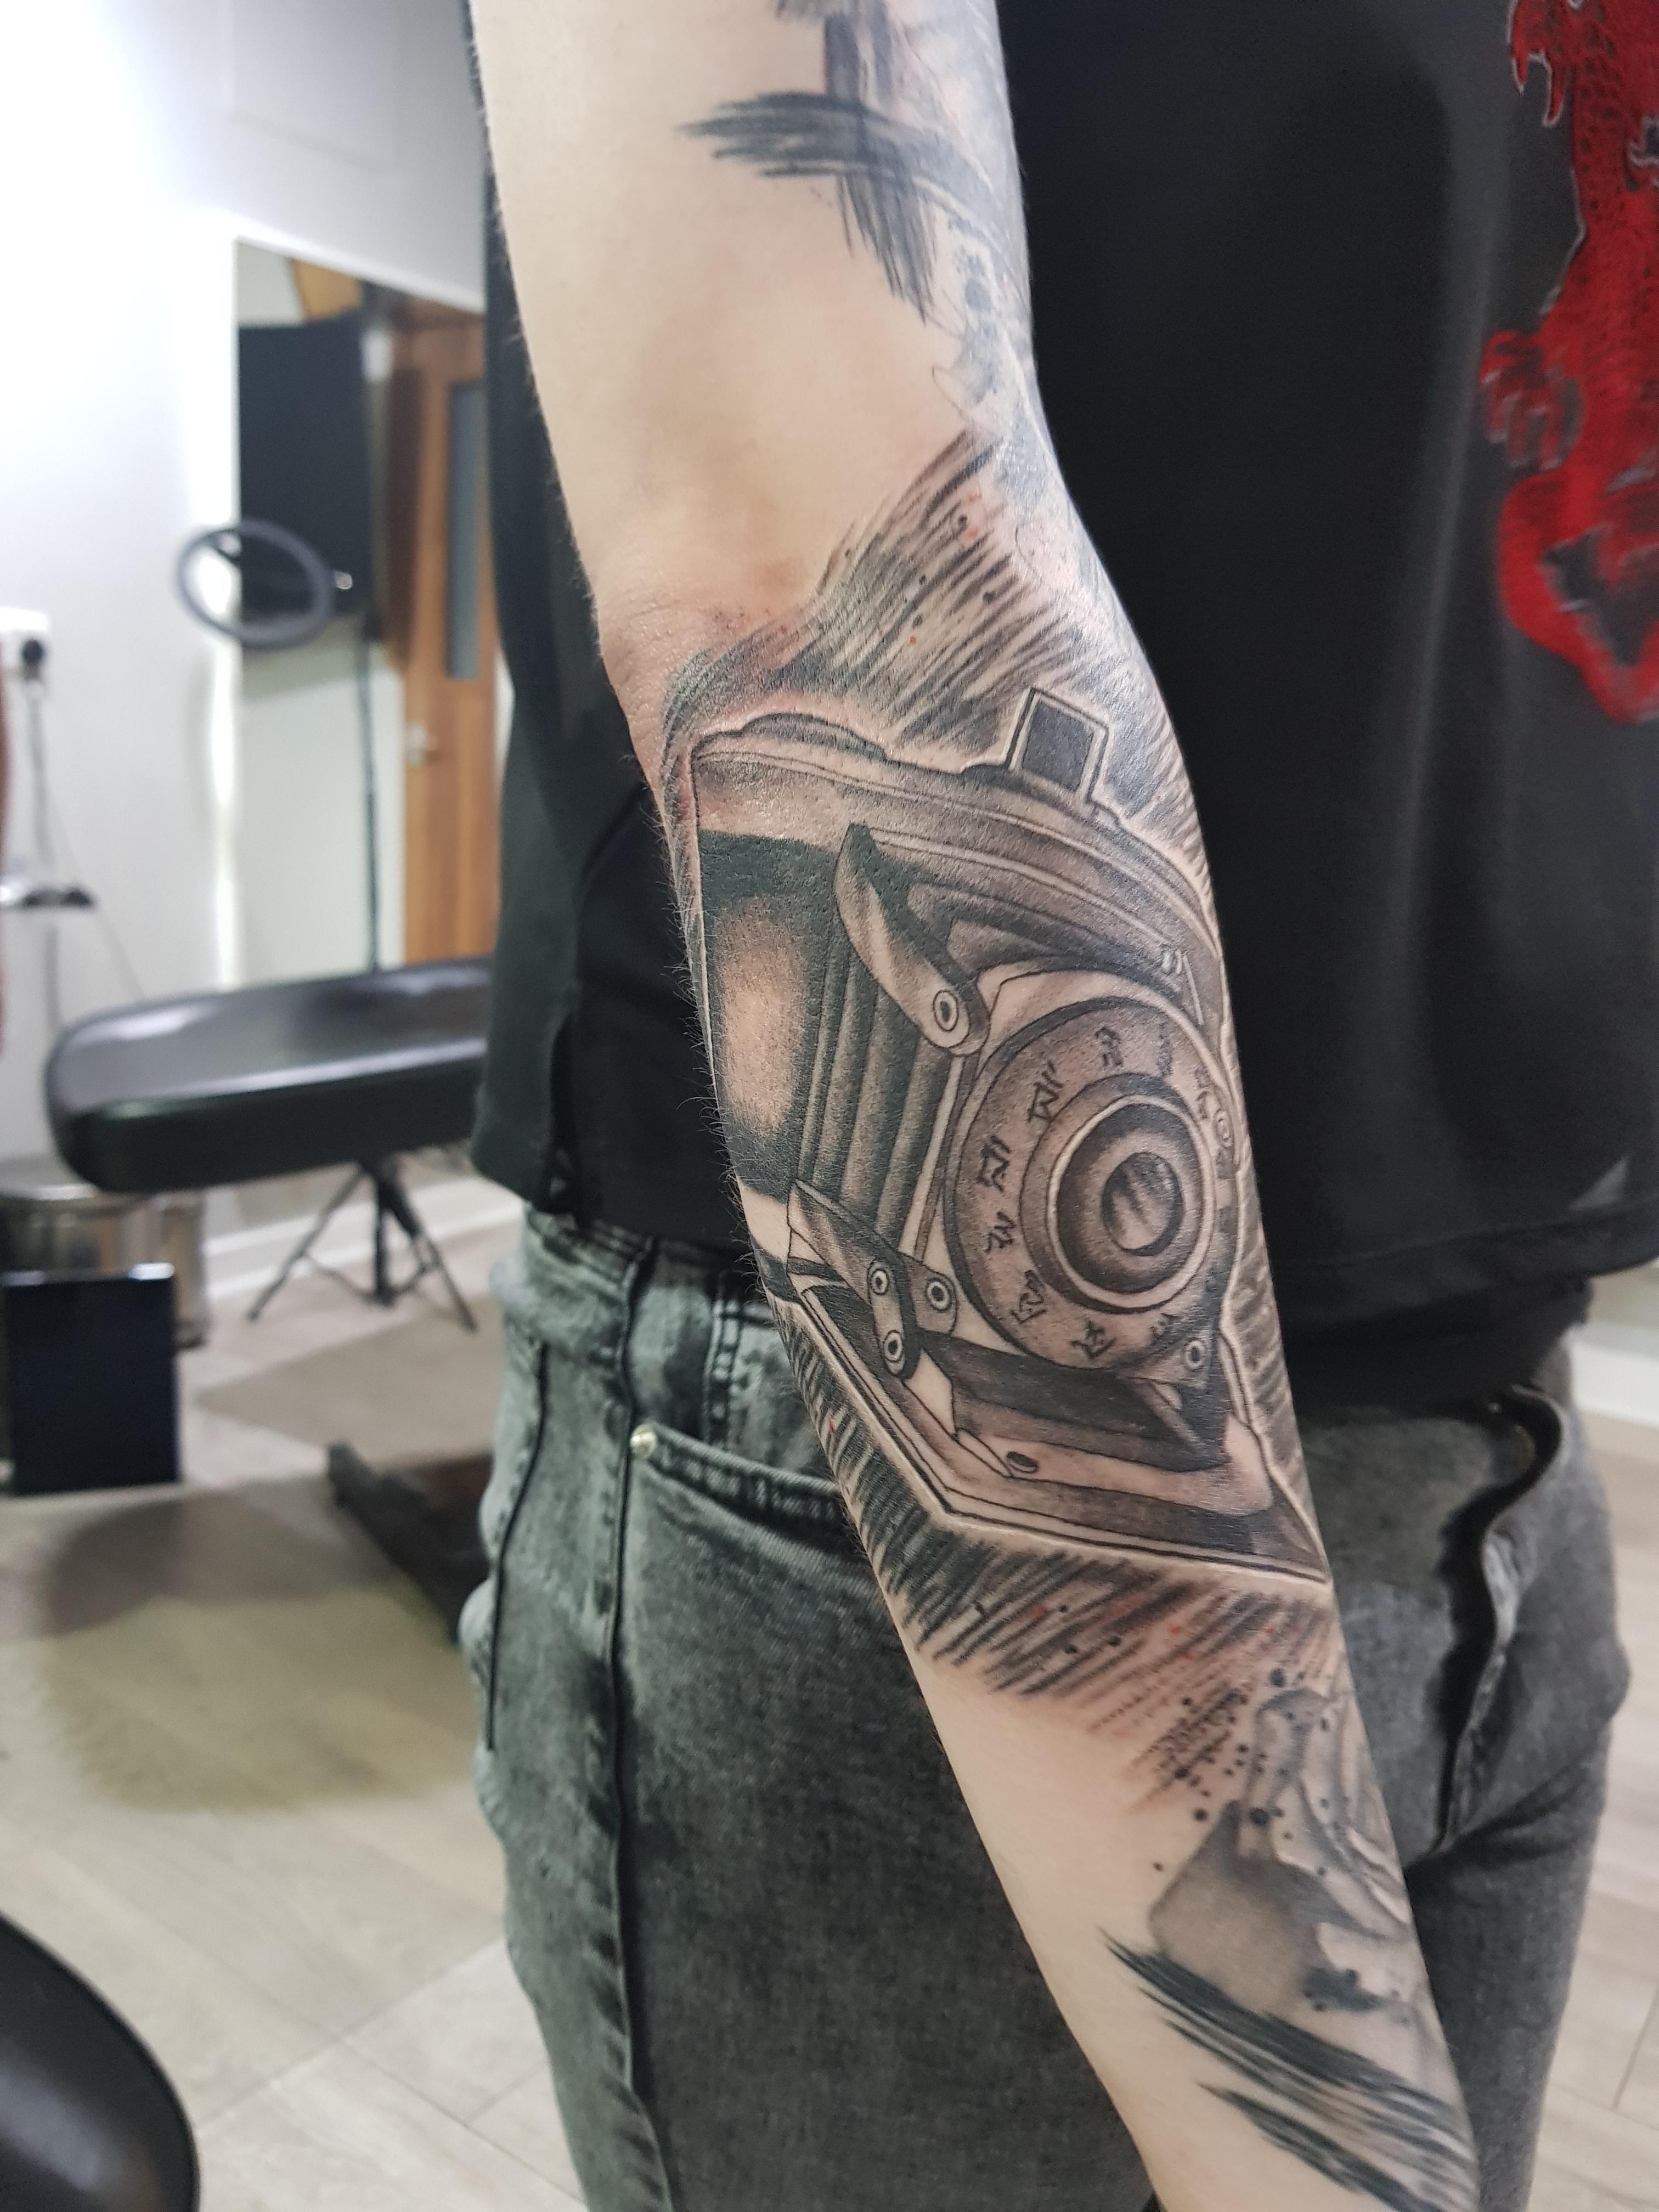 Bit Of A Niche One Camera Obscura From Fatal Frame 2 Done By Tattoosbyblakeman In Birmingham Uk I M O B S E S S E D Already In 2020 Fatal Frame Camera Obscura Prison Tattoos